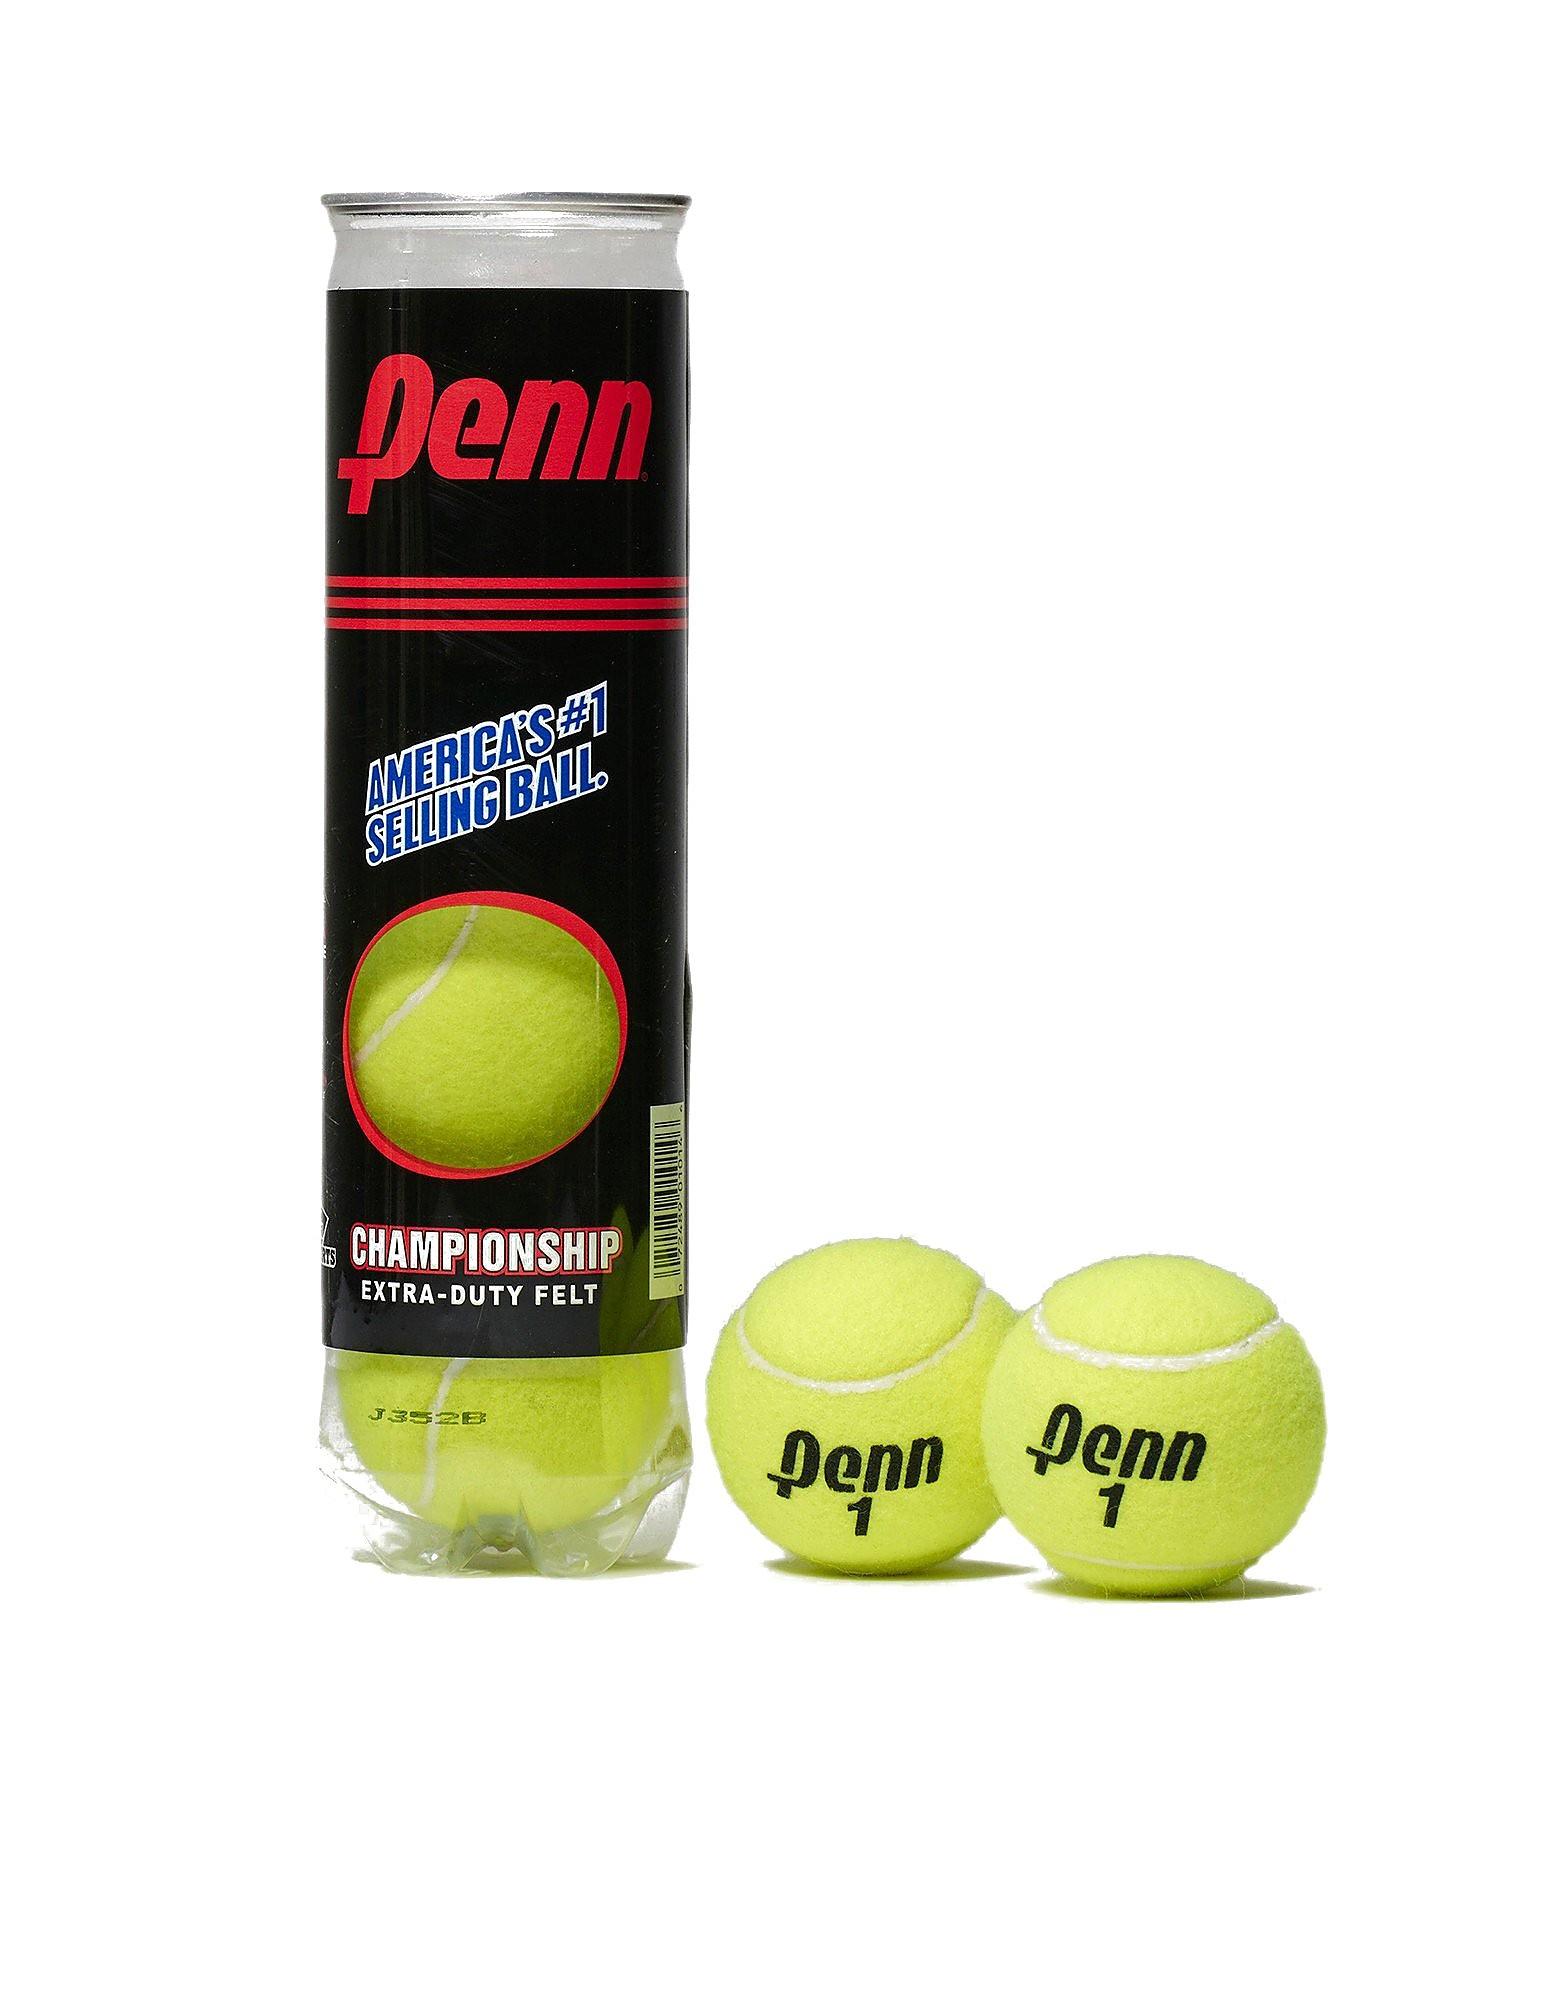 Penn Championship Tennis 4 Balls